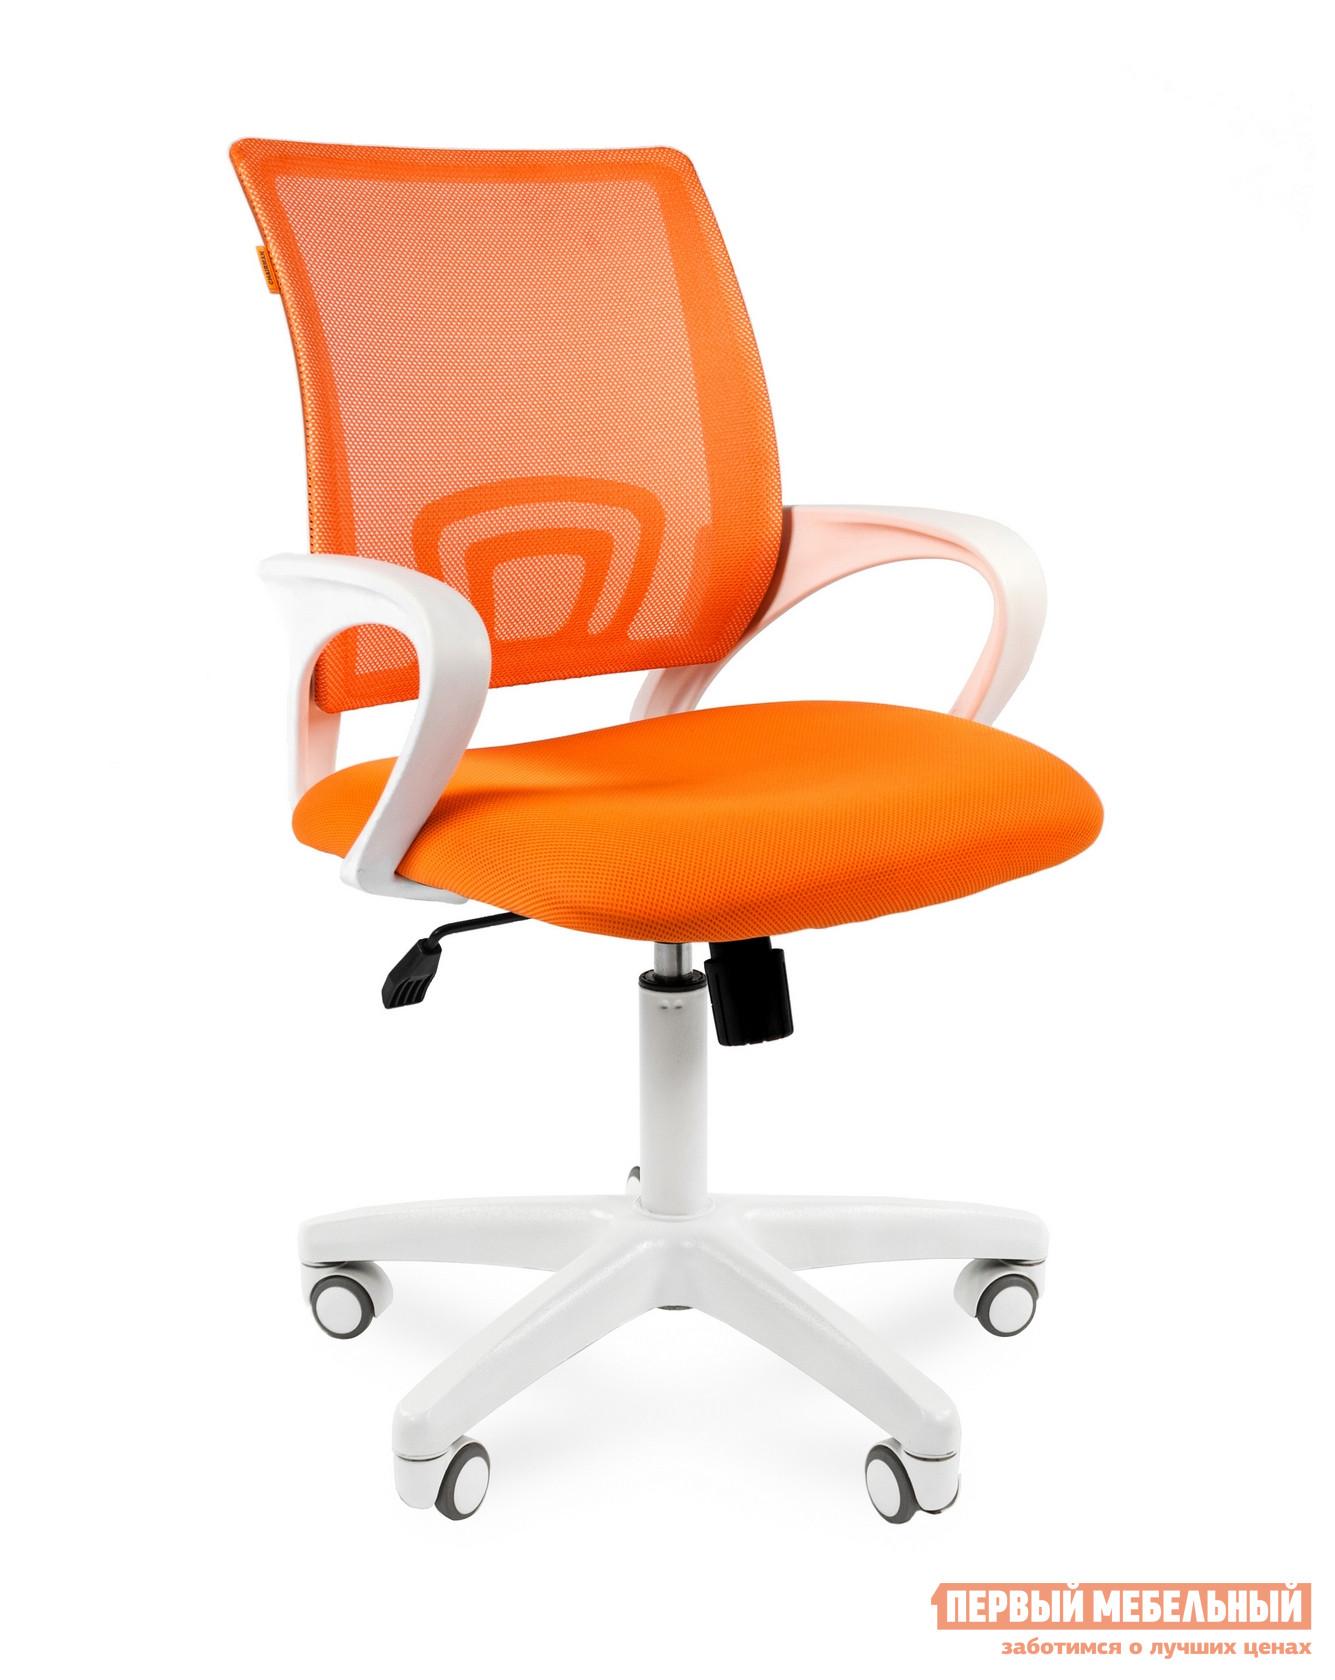 Кресло для офиса Chairman CH 696 white Ткань TW-16 / Сетка TW-66 оранжевый от Купистол